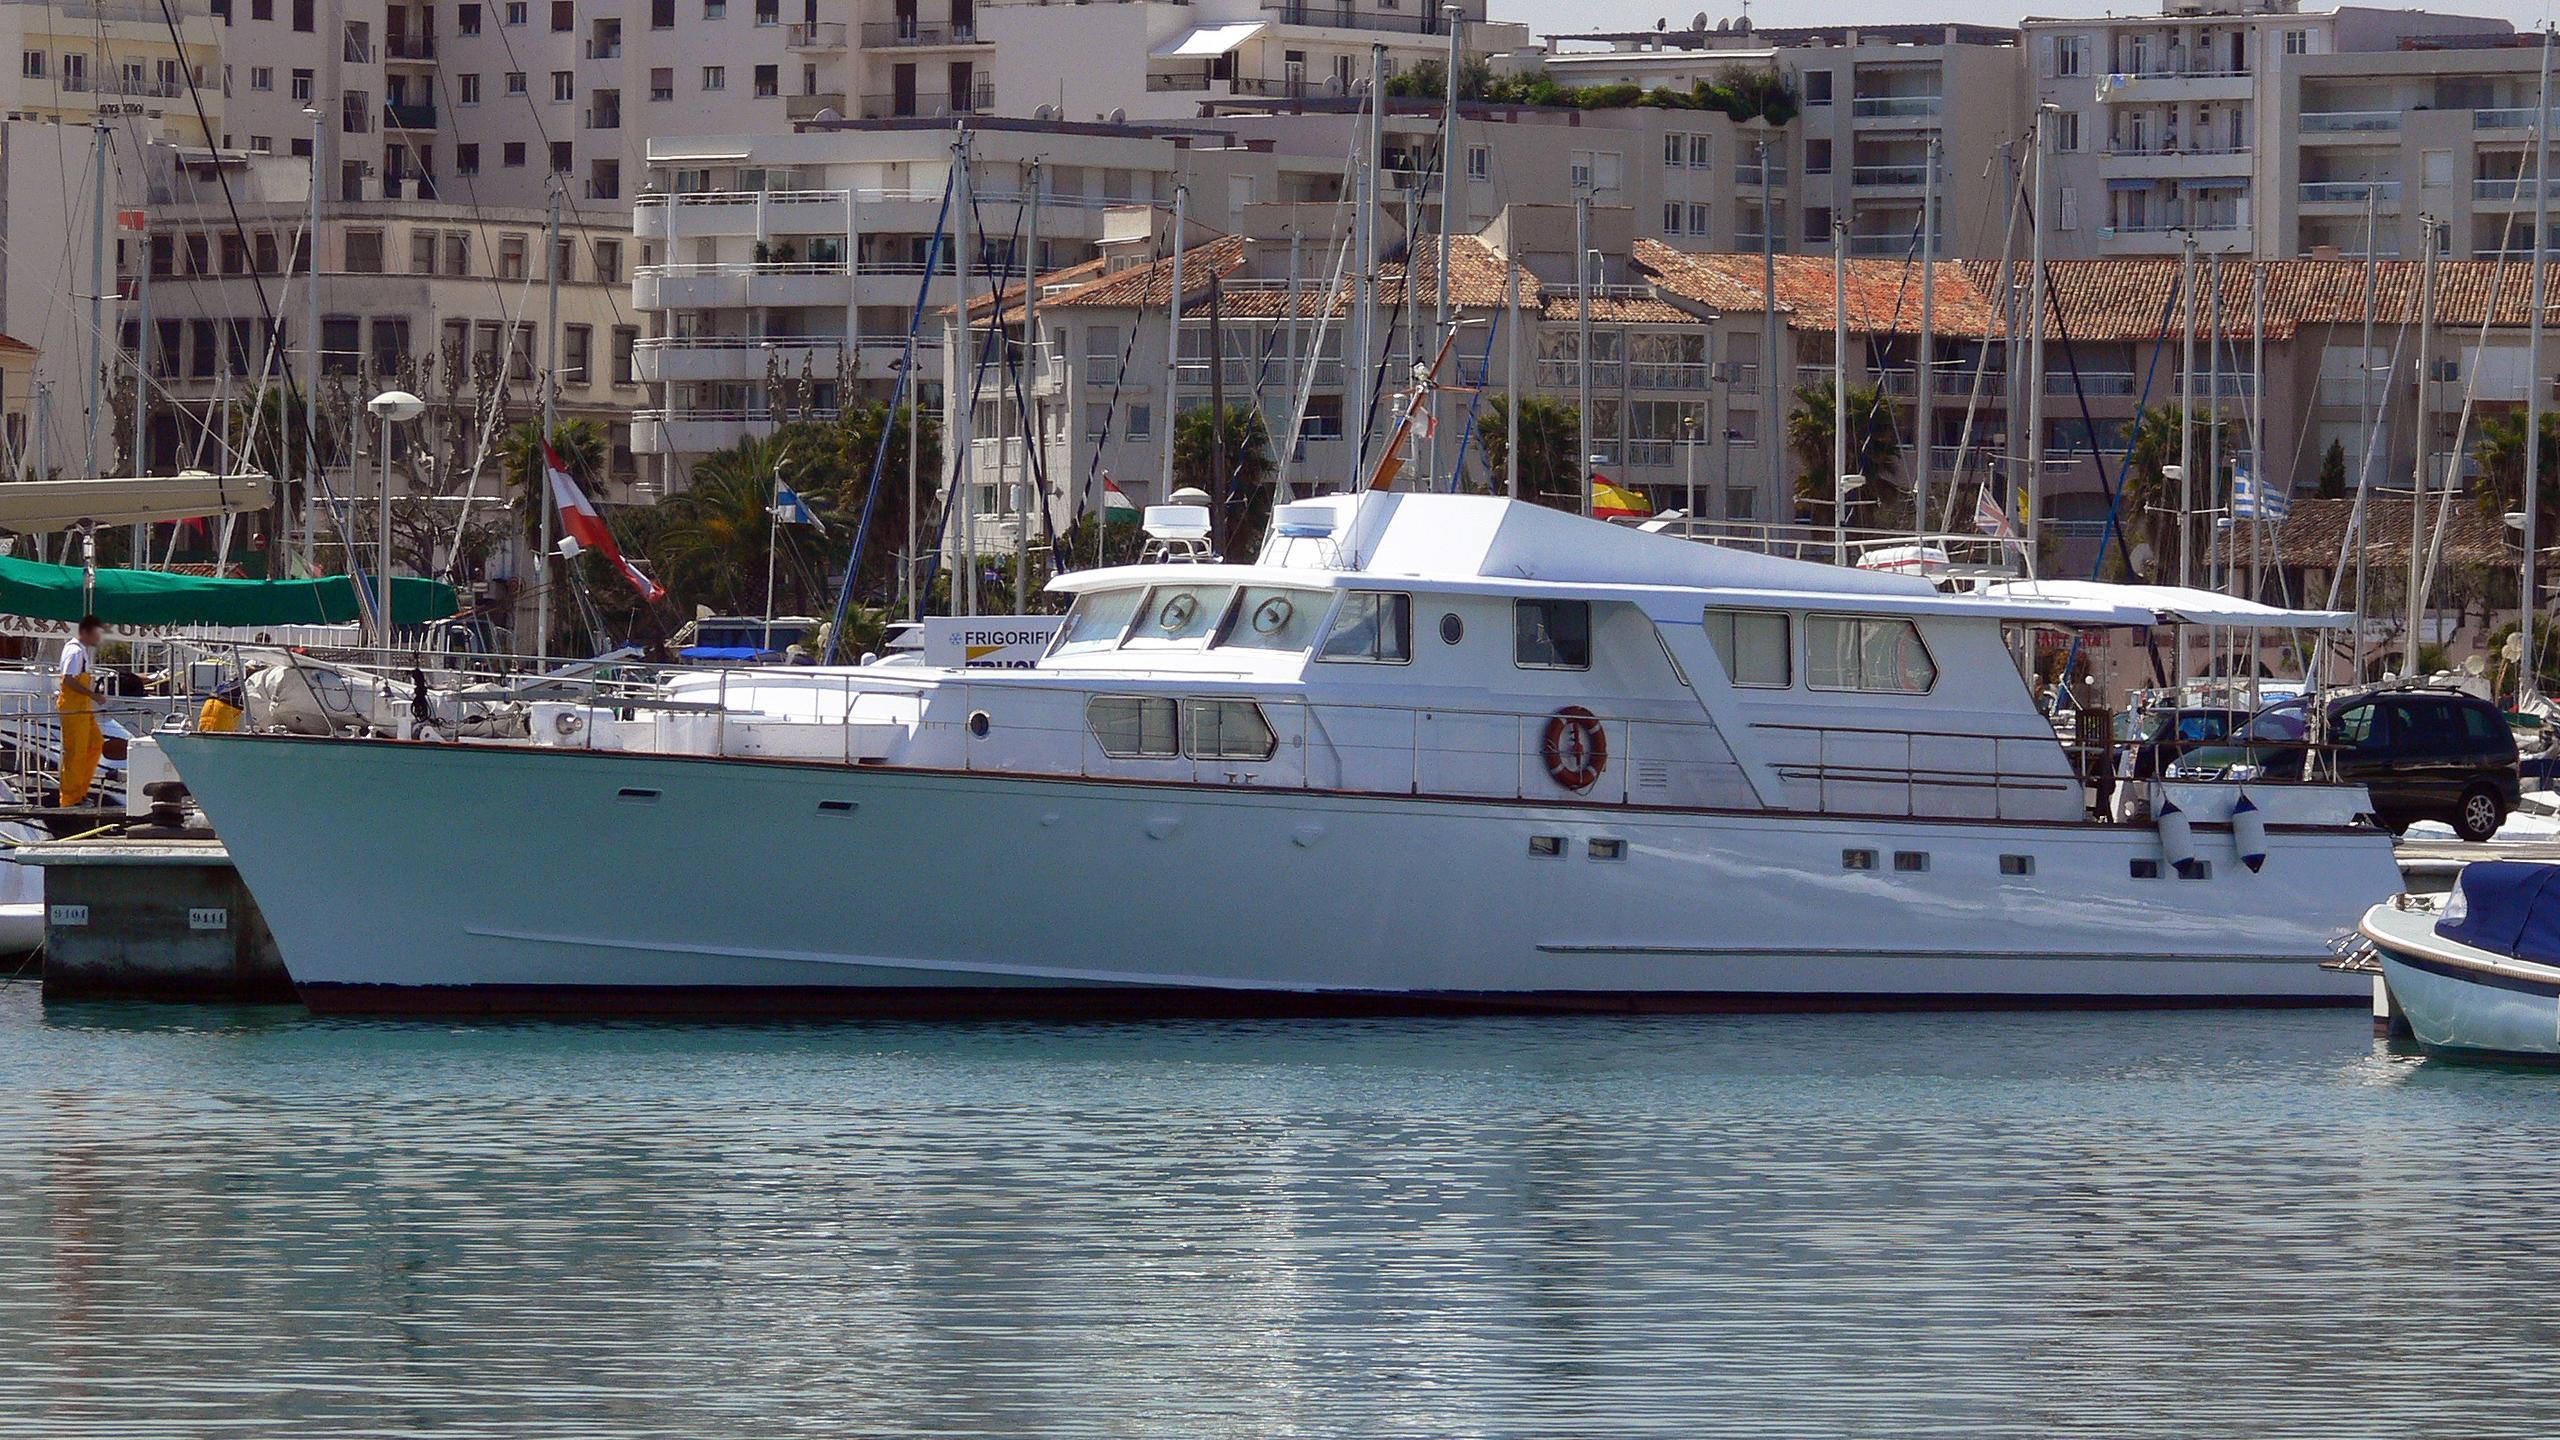 jalas-motor-yacht-esterel-26-1973-26m-profile